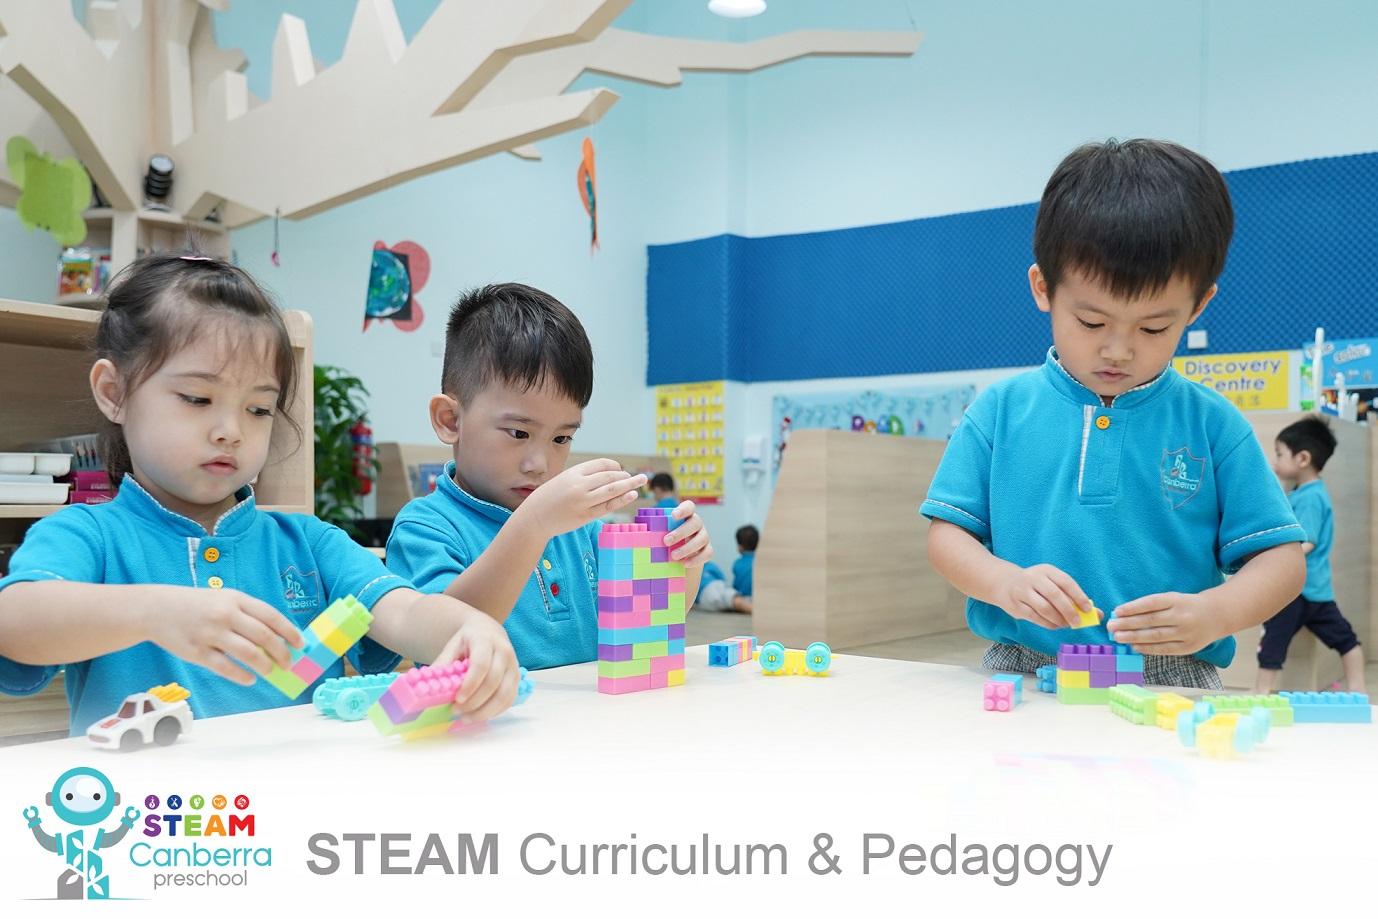 Personal Tour of Canberra Preschool @ Kovan | Sembawang